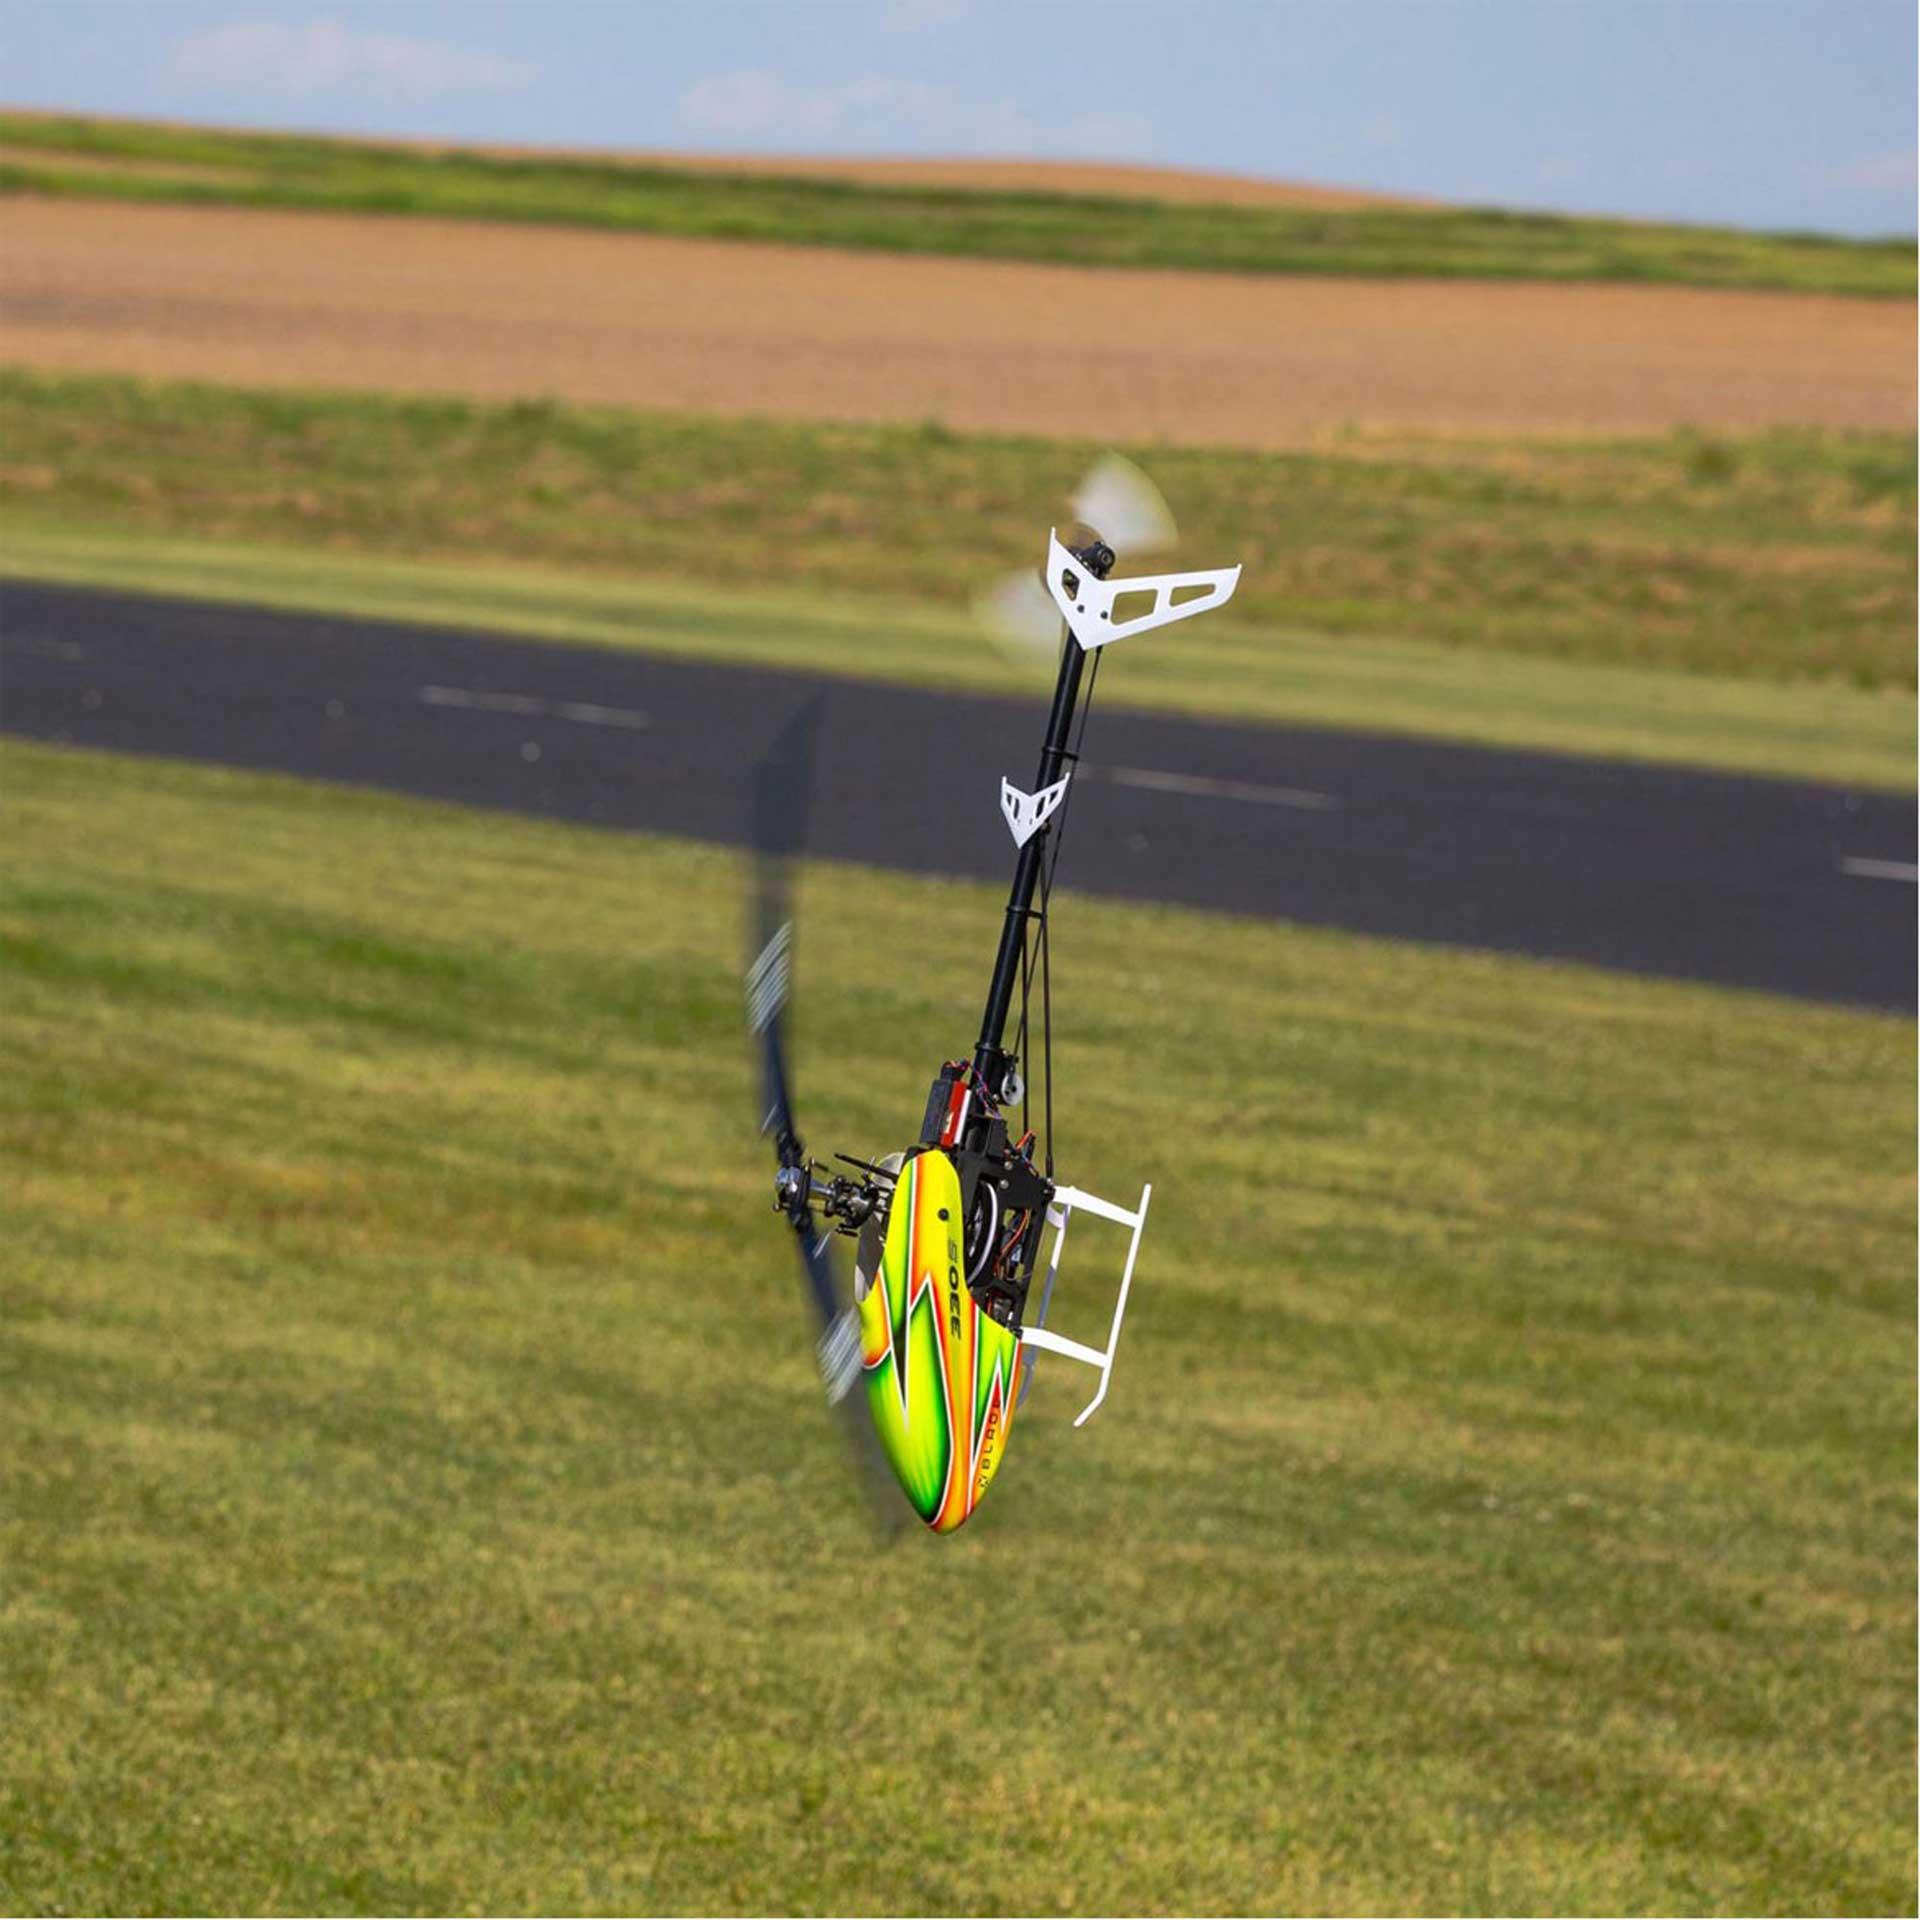 BLADE 330 S BNF BASIC HELI Hubschrauber / Helikopter